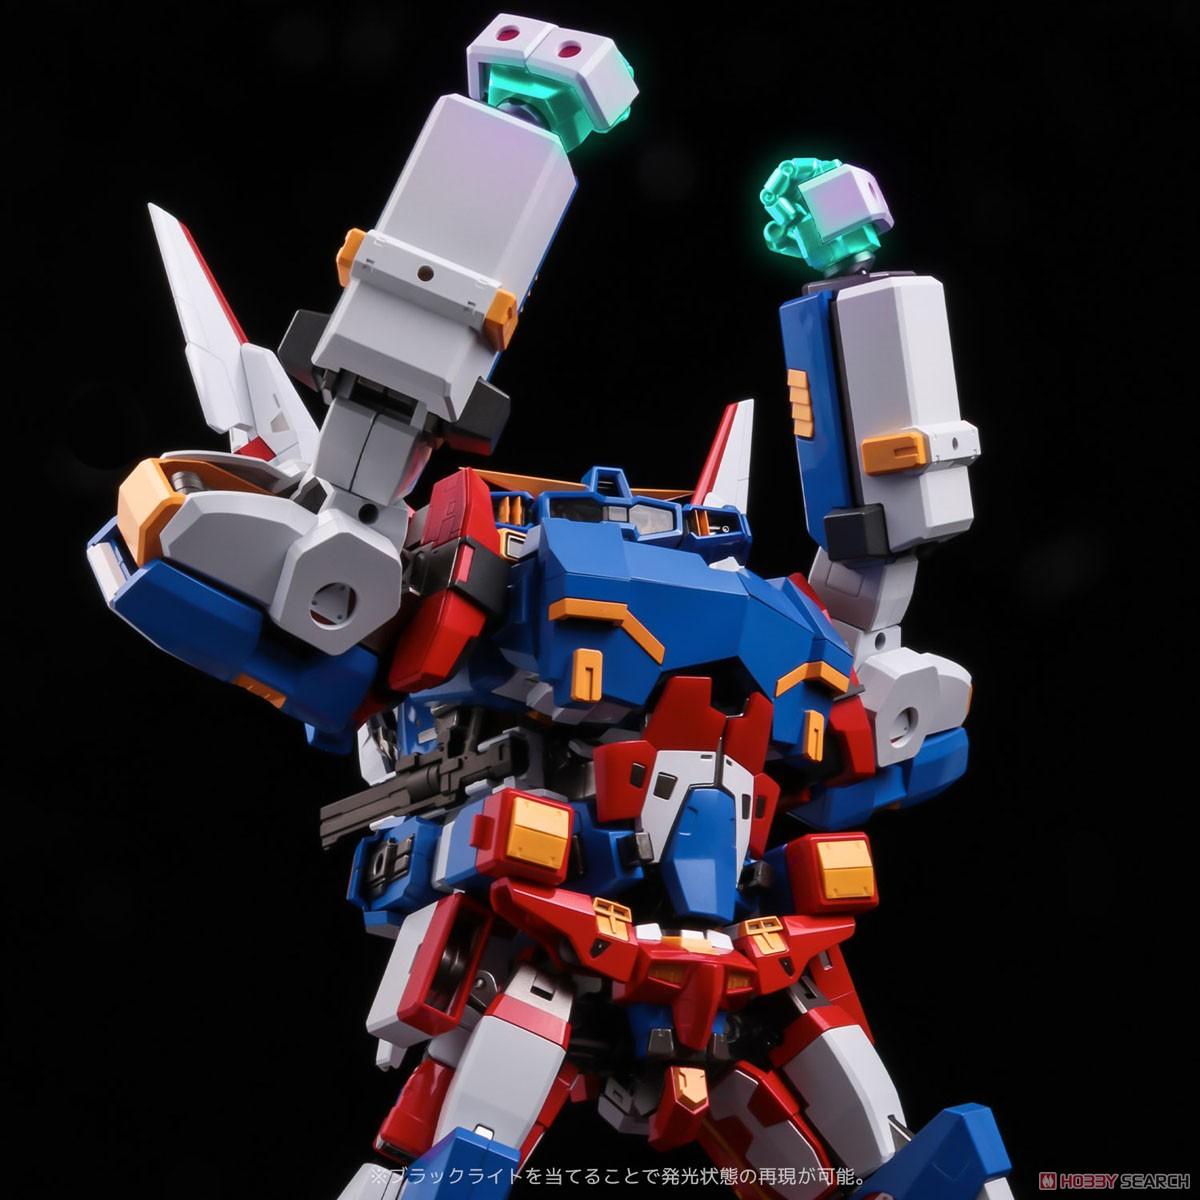 RIOBOT『変形合体 R-1』スーパーロボット大戦OG 可変合体フィギュア-046